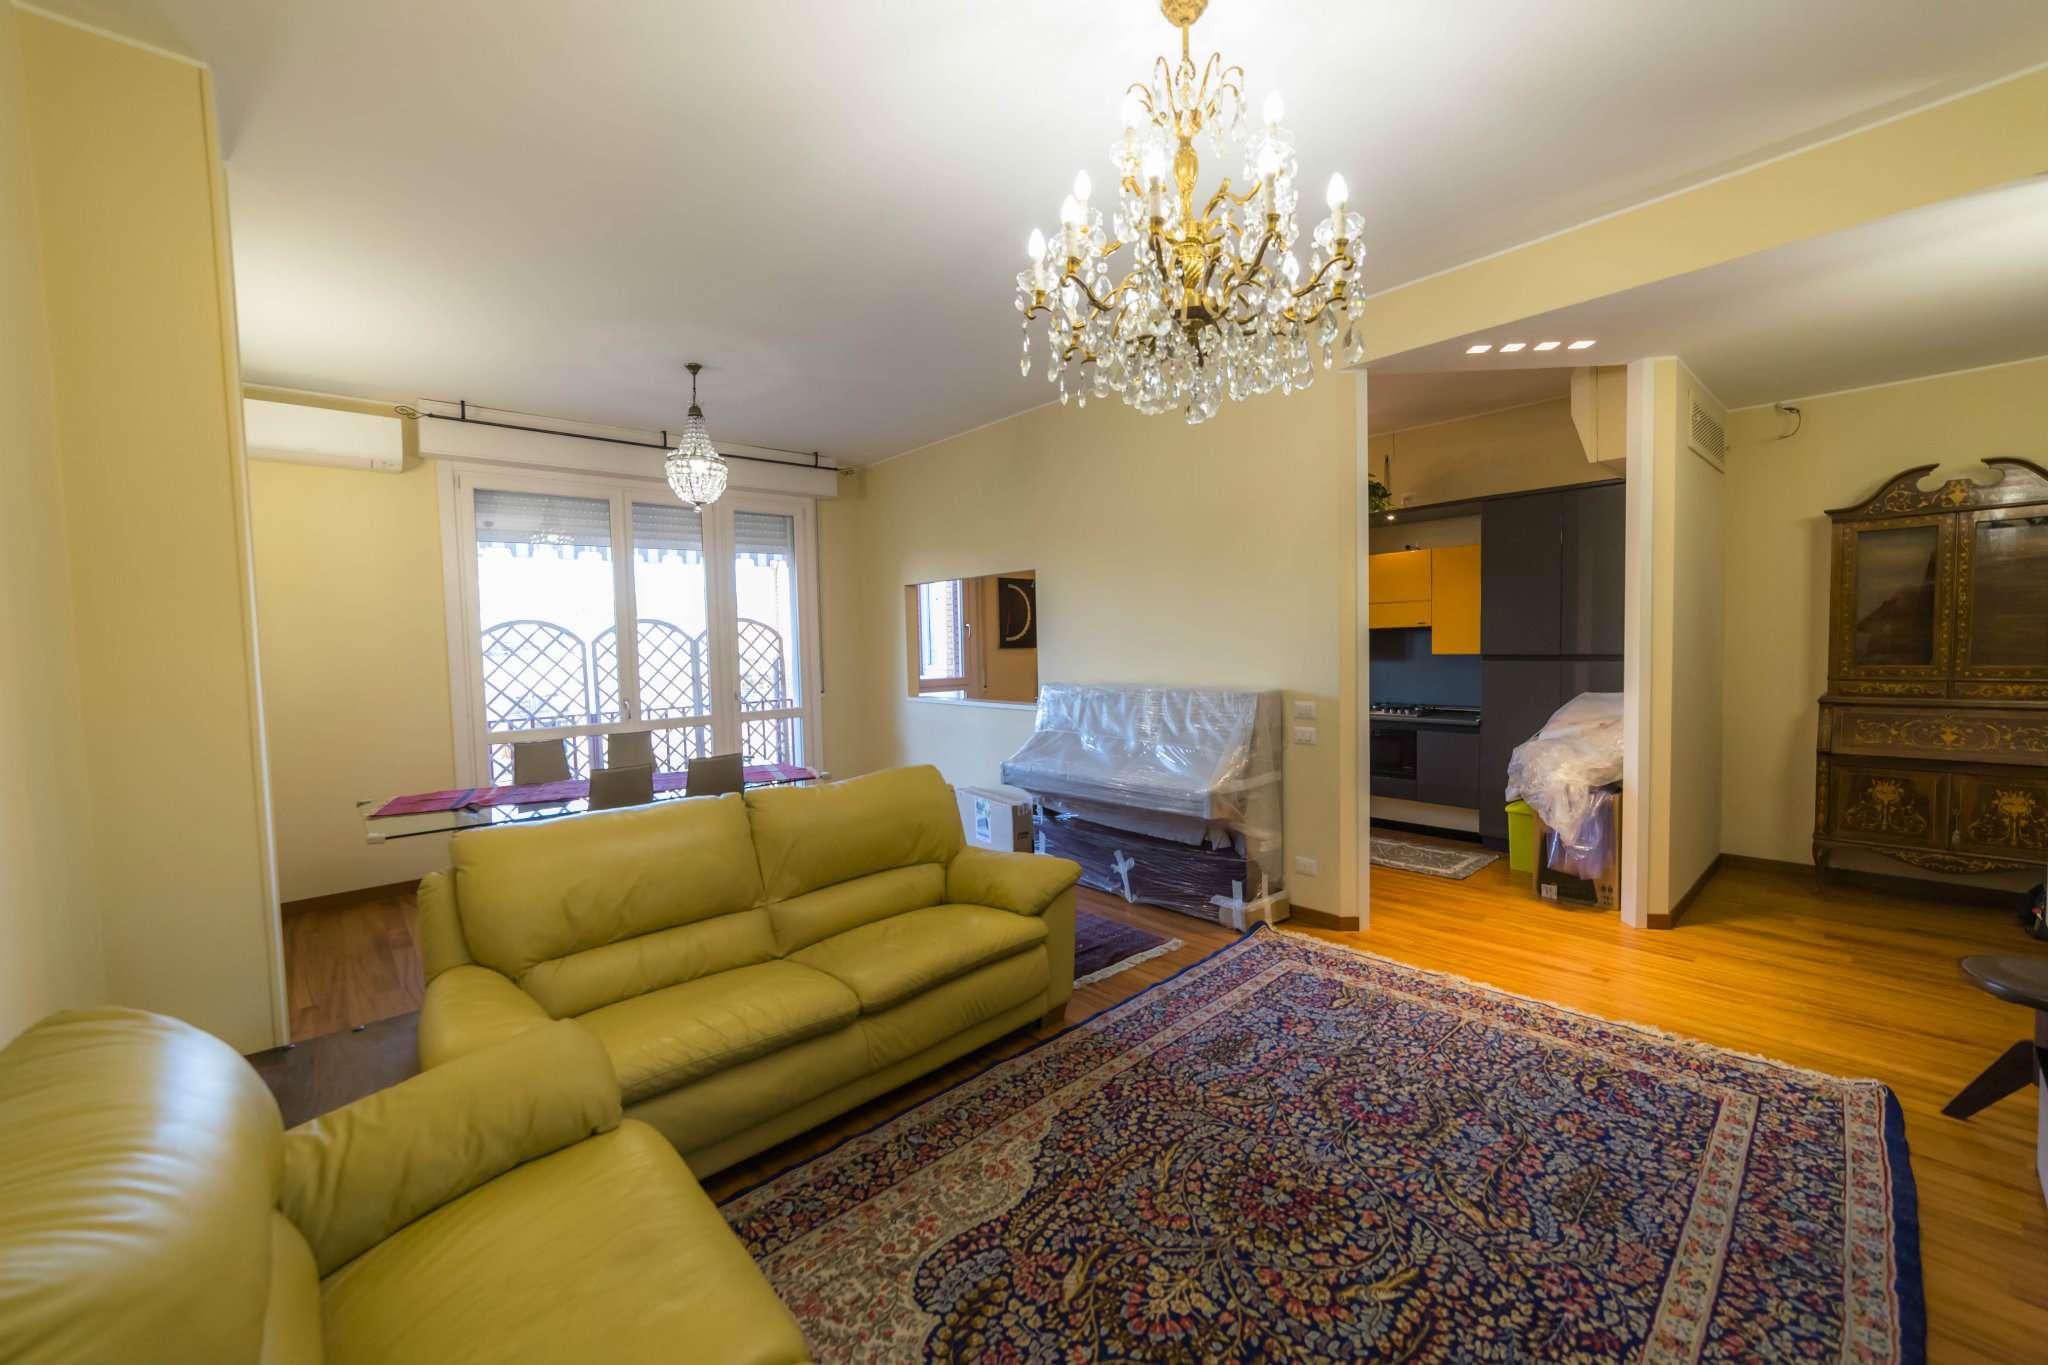 Appartamento, via casalino 5h, Centro Storico, Sant'Anna, Pignolo, Vendita - Bergamo (BG)